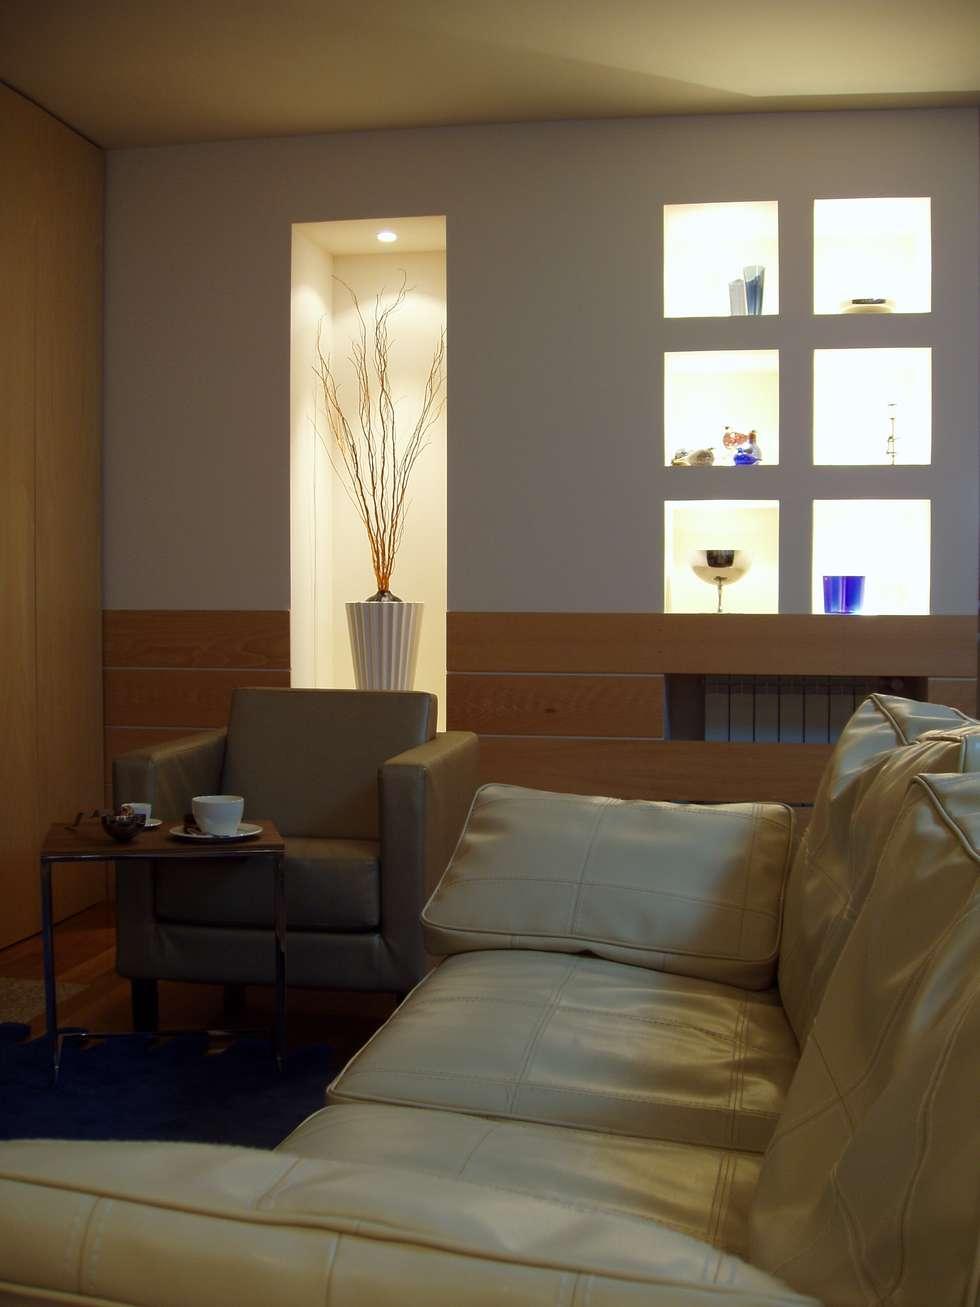 Sala de Estar: Salas de estar modernas por Inexistencia Lda